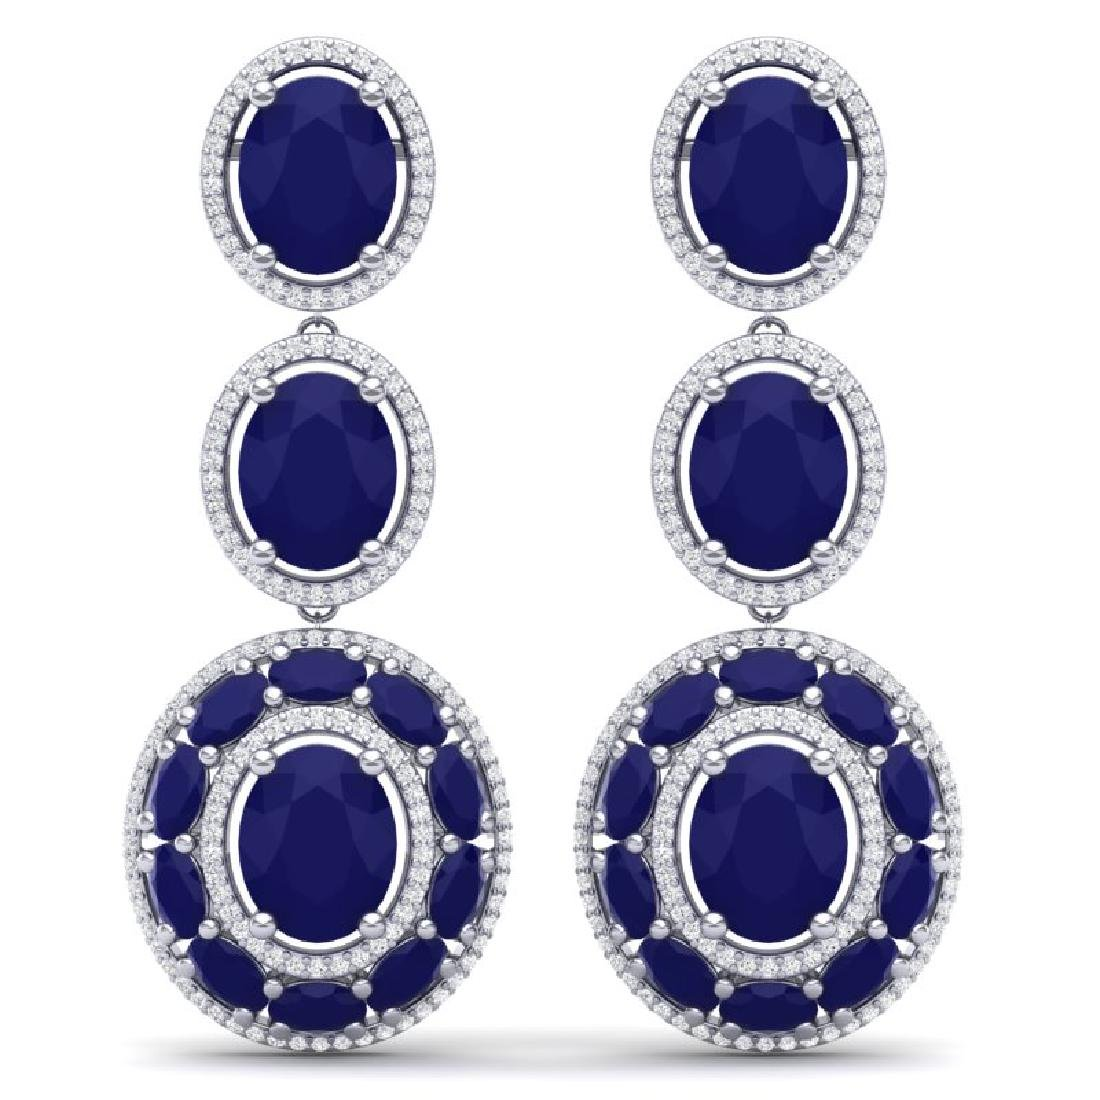 32.84 CTW Royalty Sapphire & VS Diamond Earrings 18K